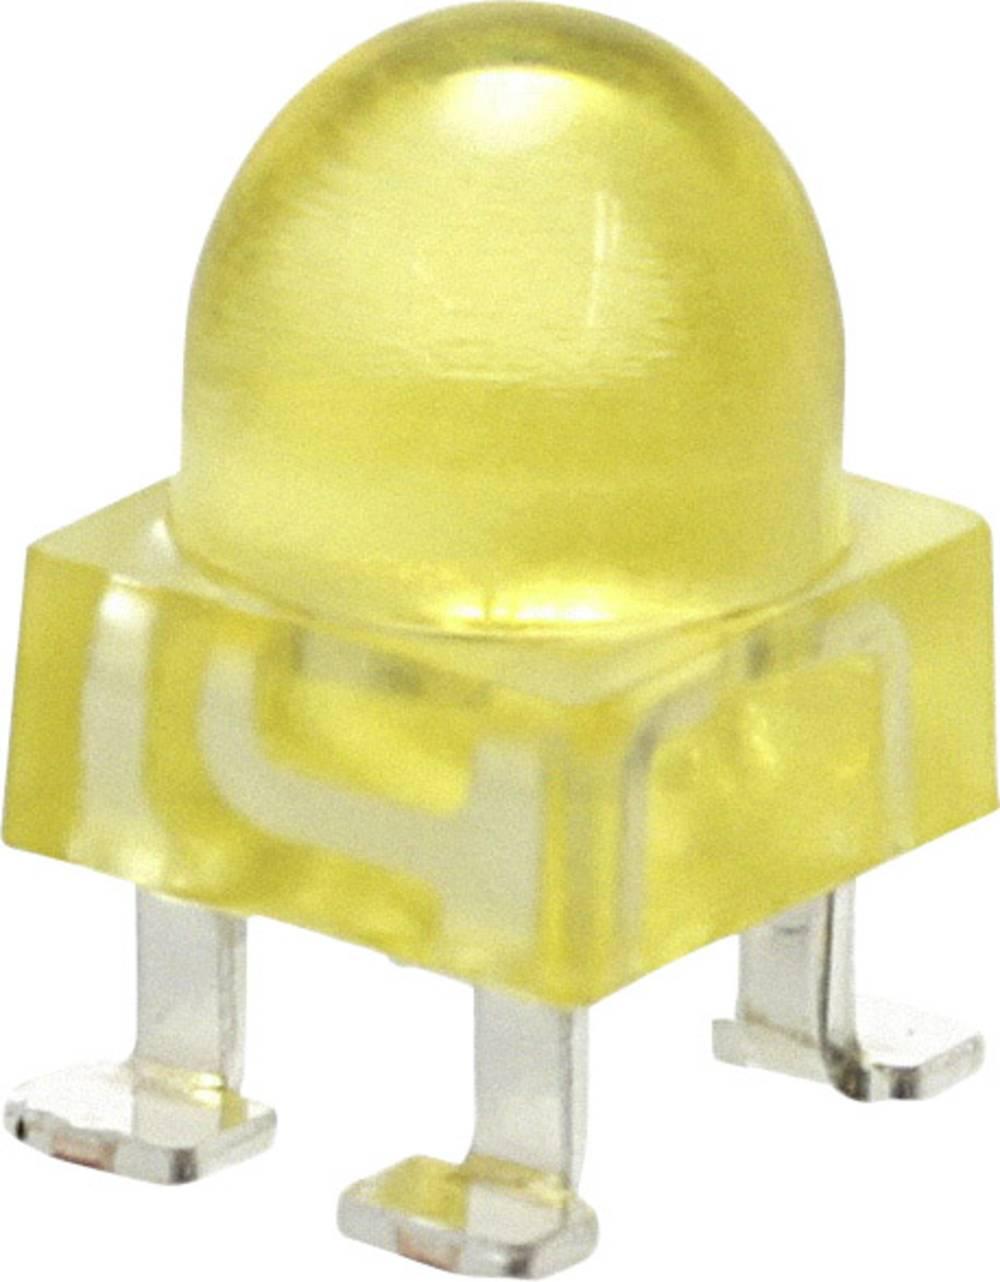 SMD LED Broadcom ALMD-EL3D-VX002 SMD-4 6750 mcd 30 ° Rav